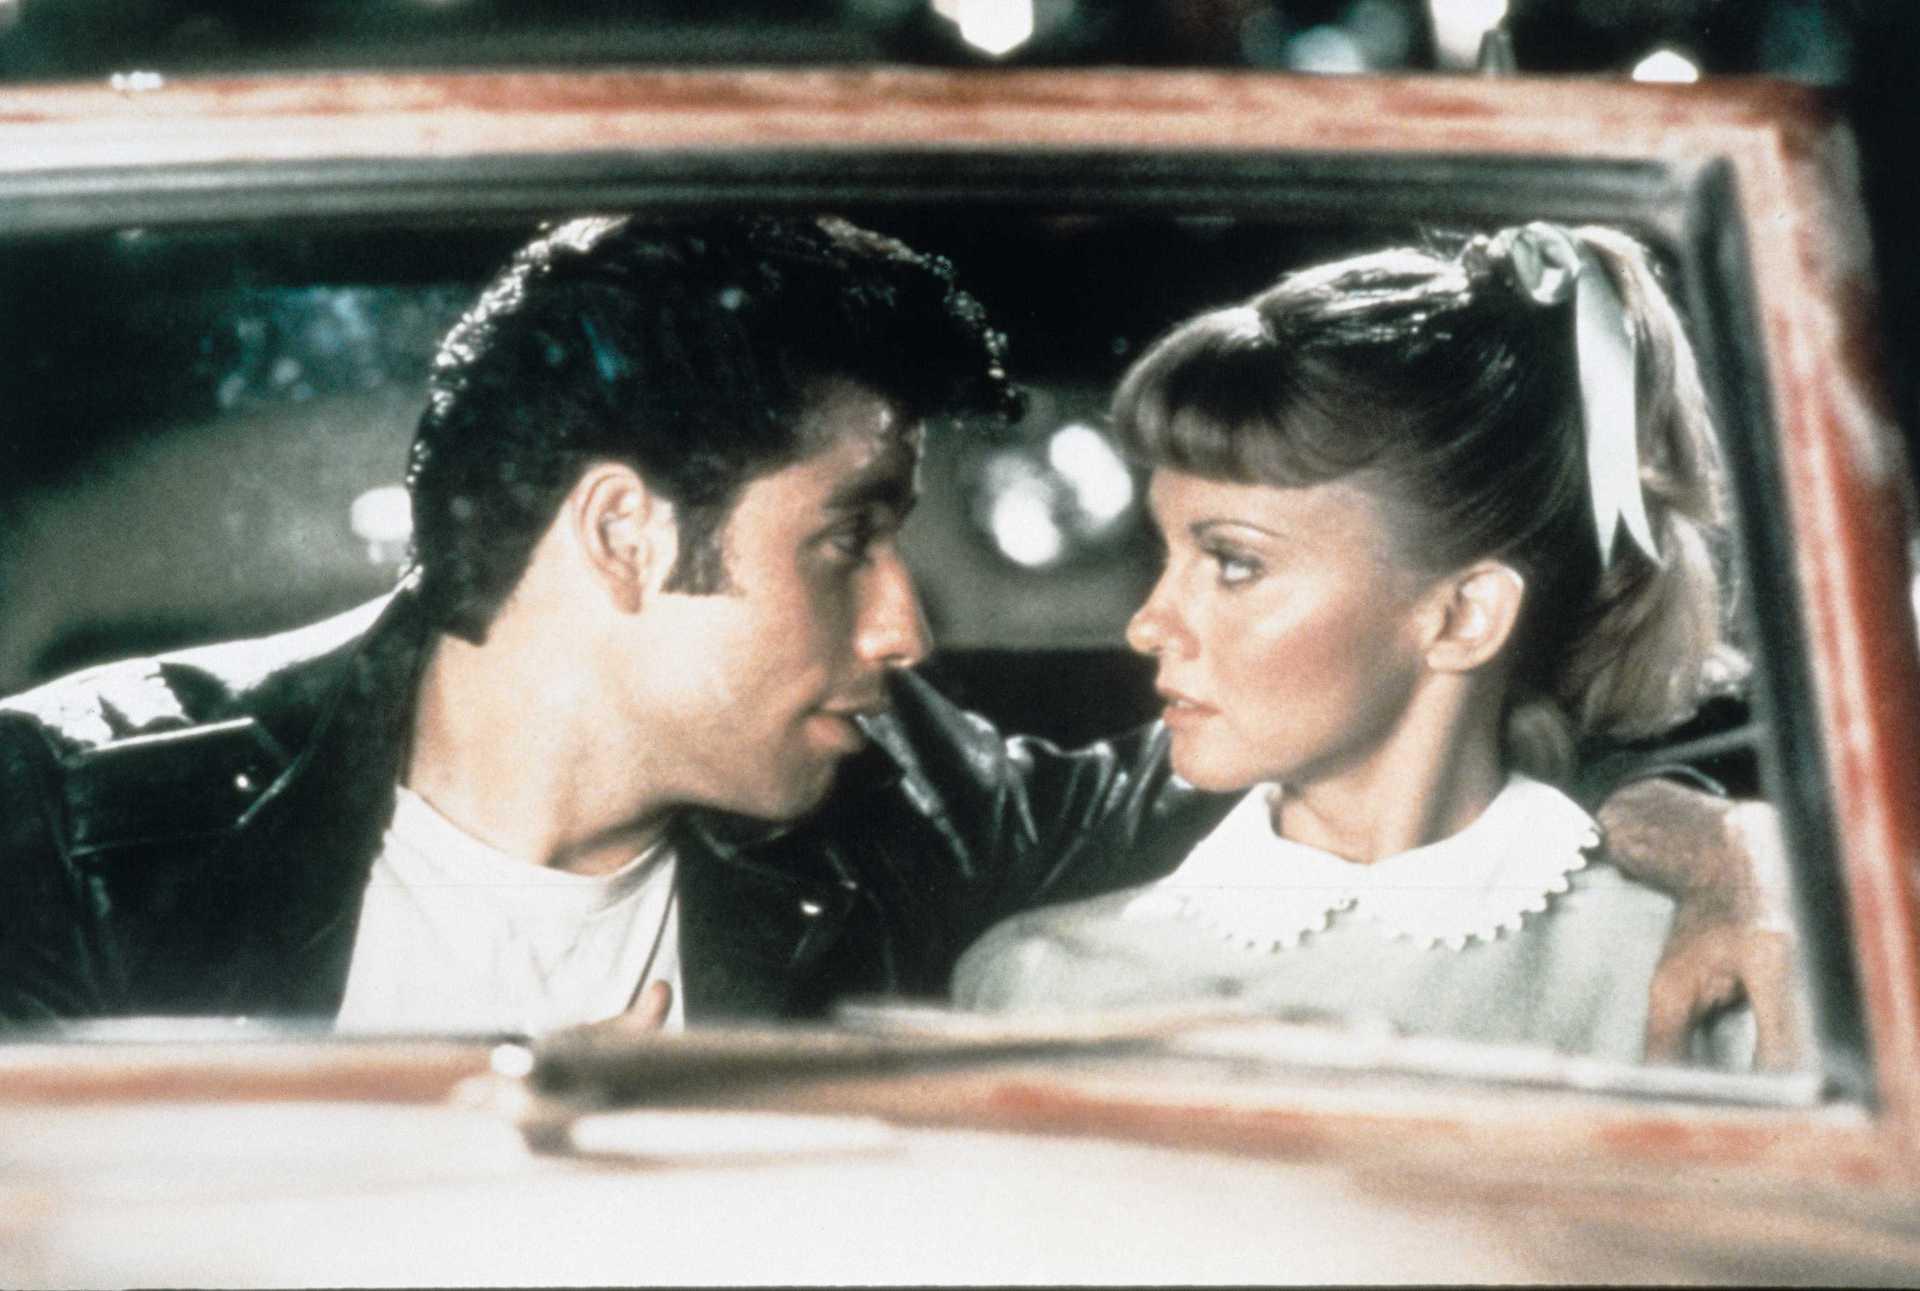 Essays on the movie grease with john travolta